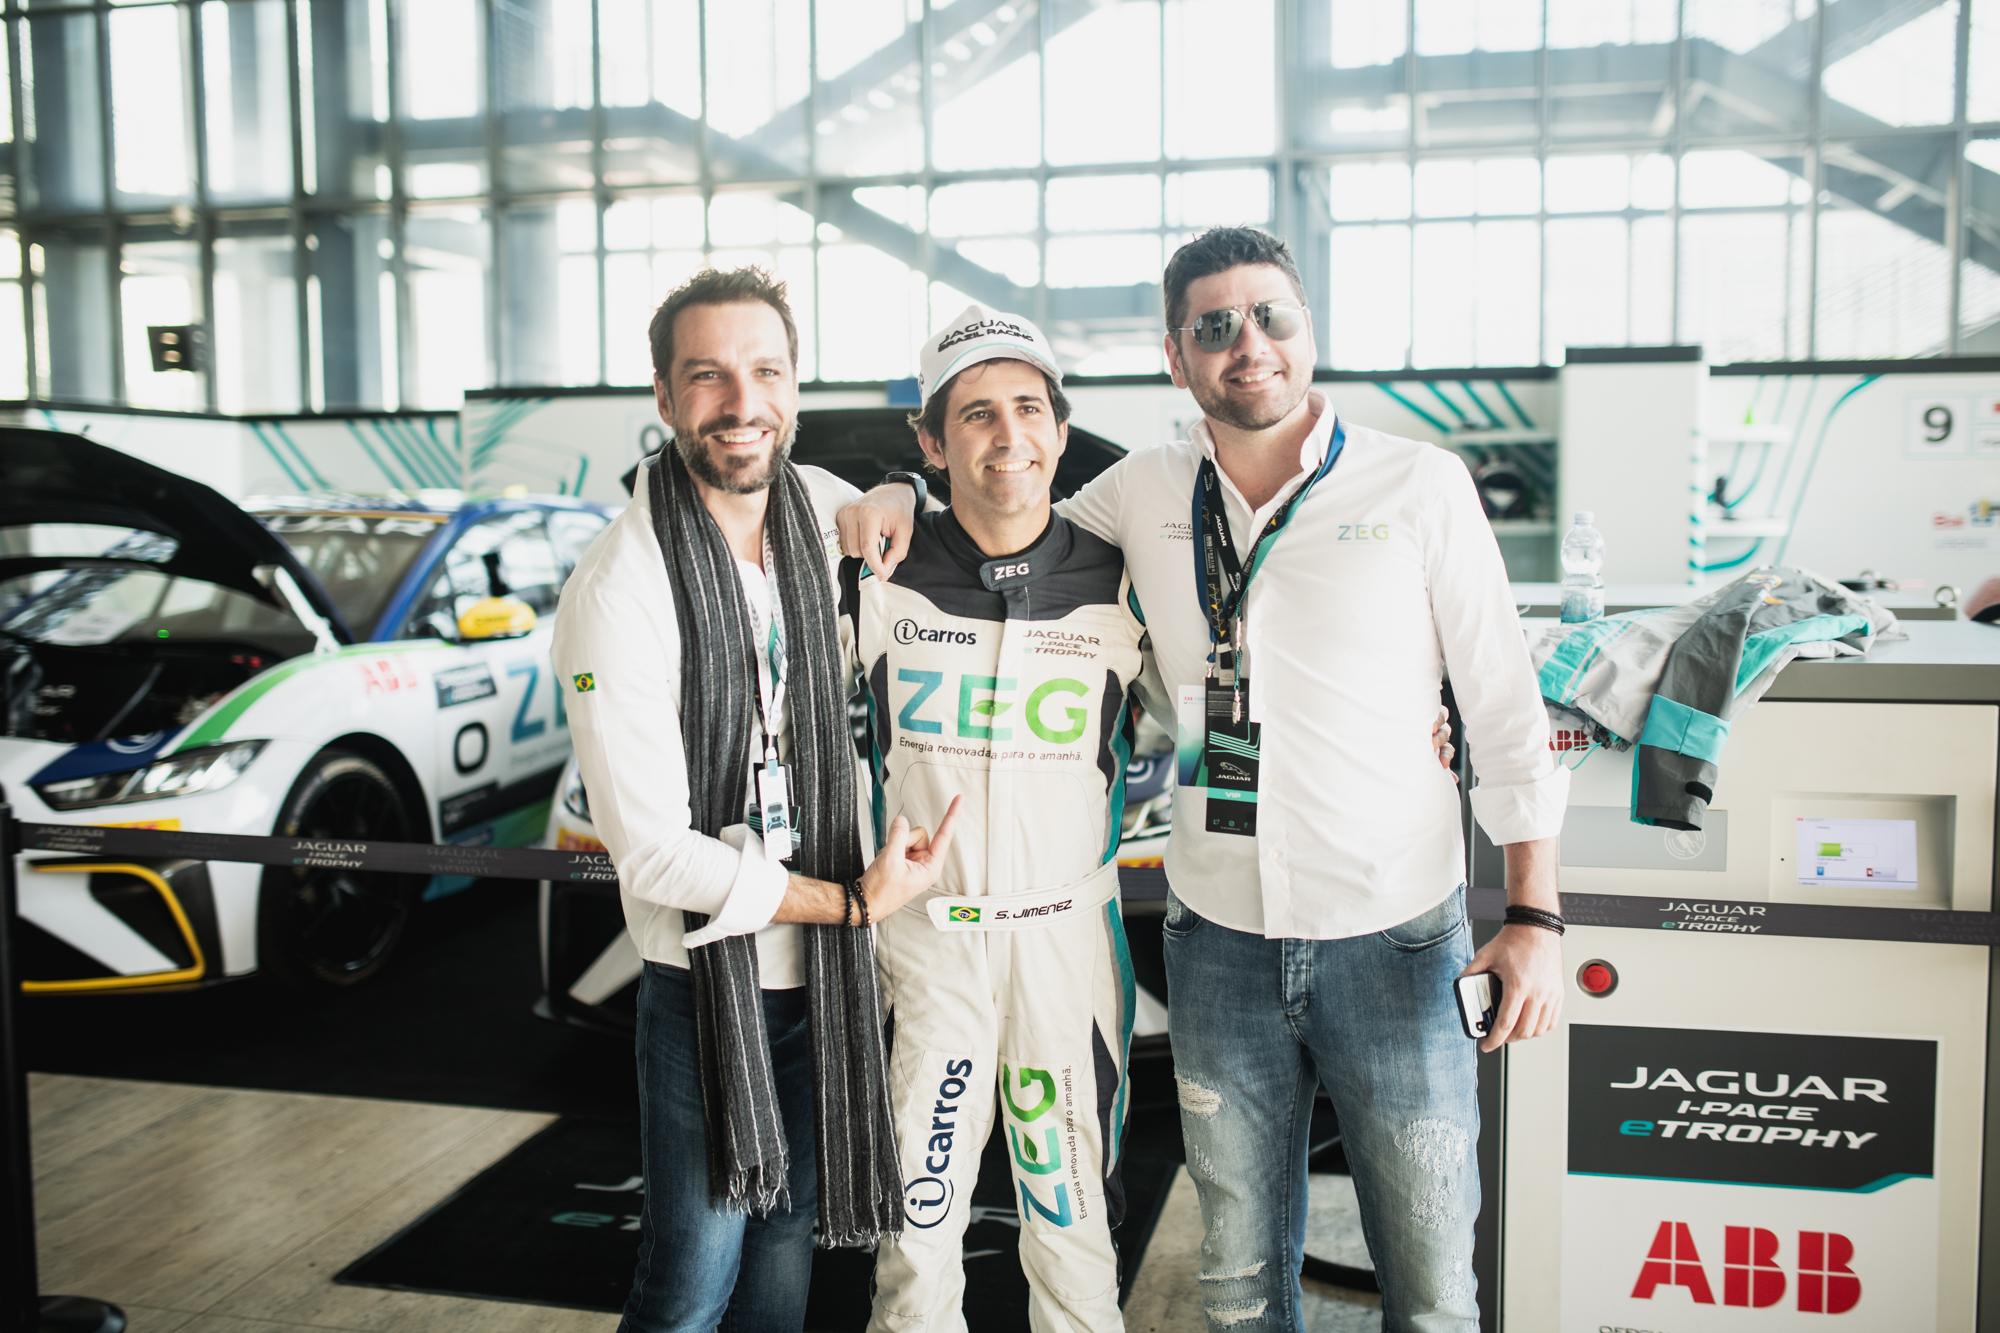 Jaguar_5.Roma_victoreleuterio_2381